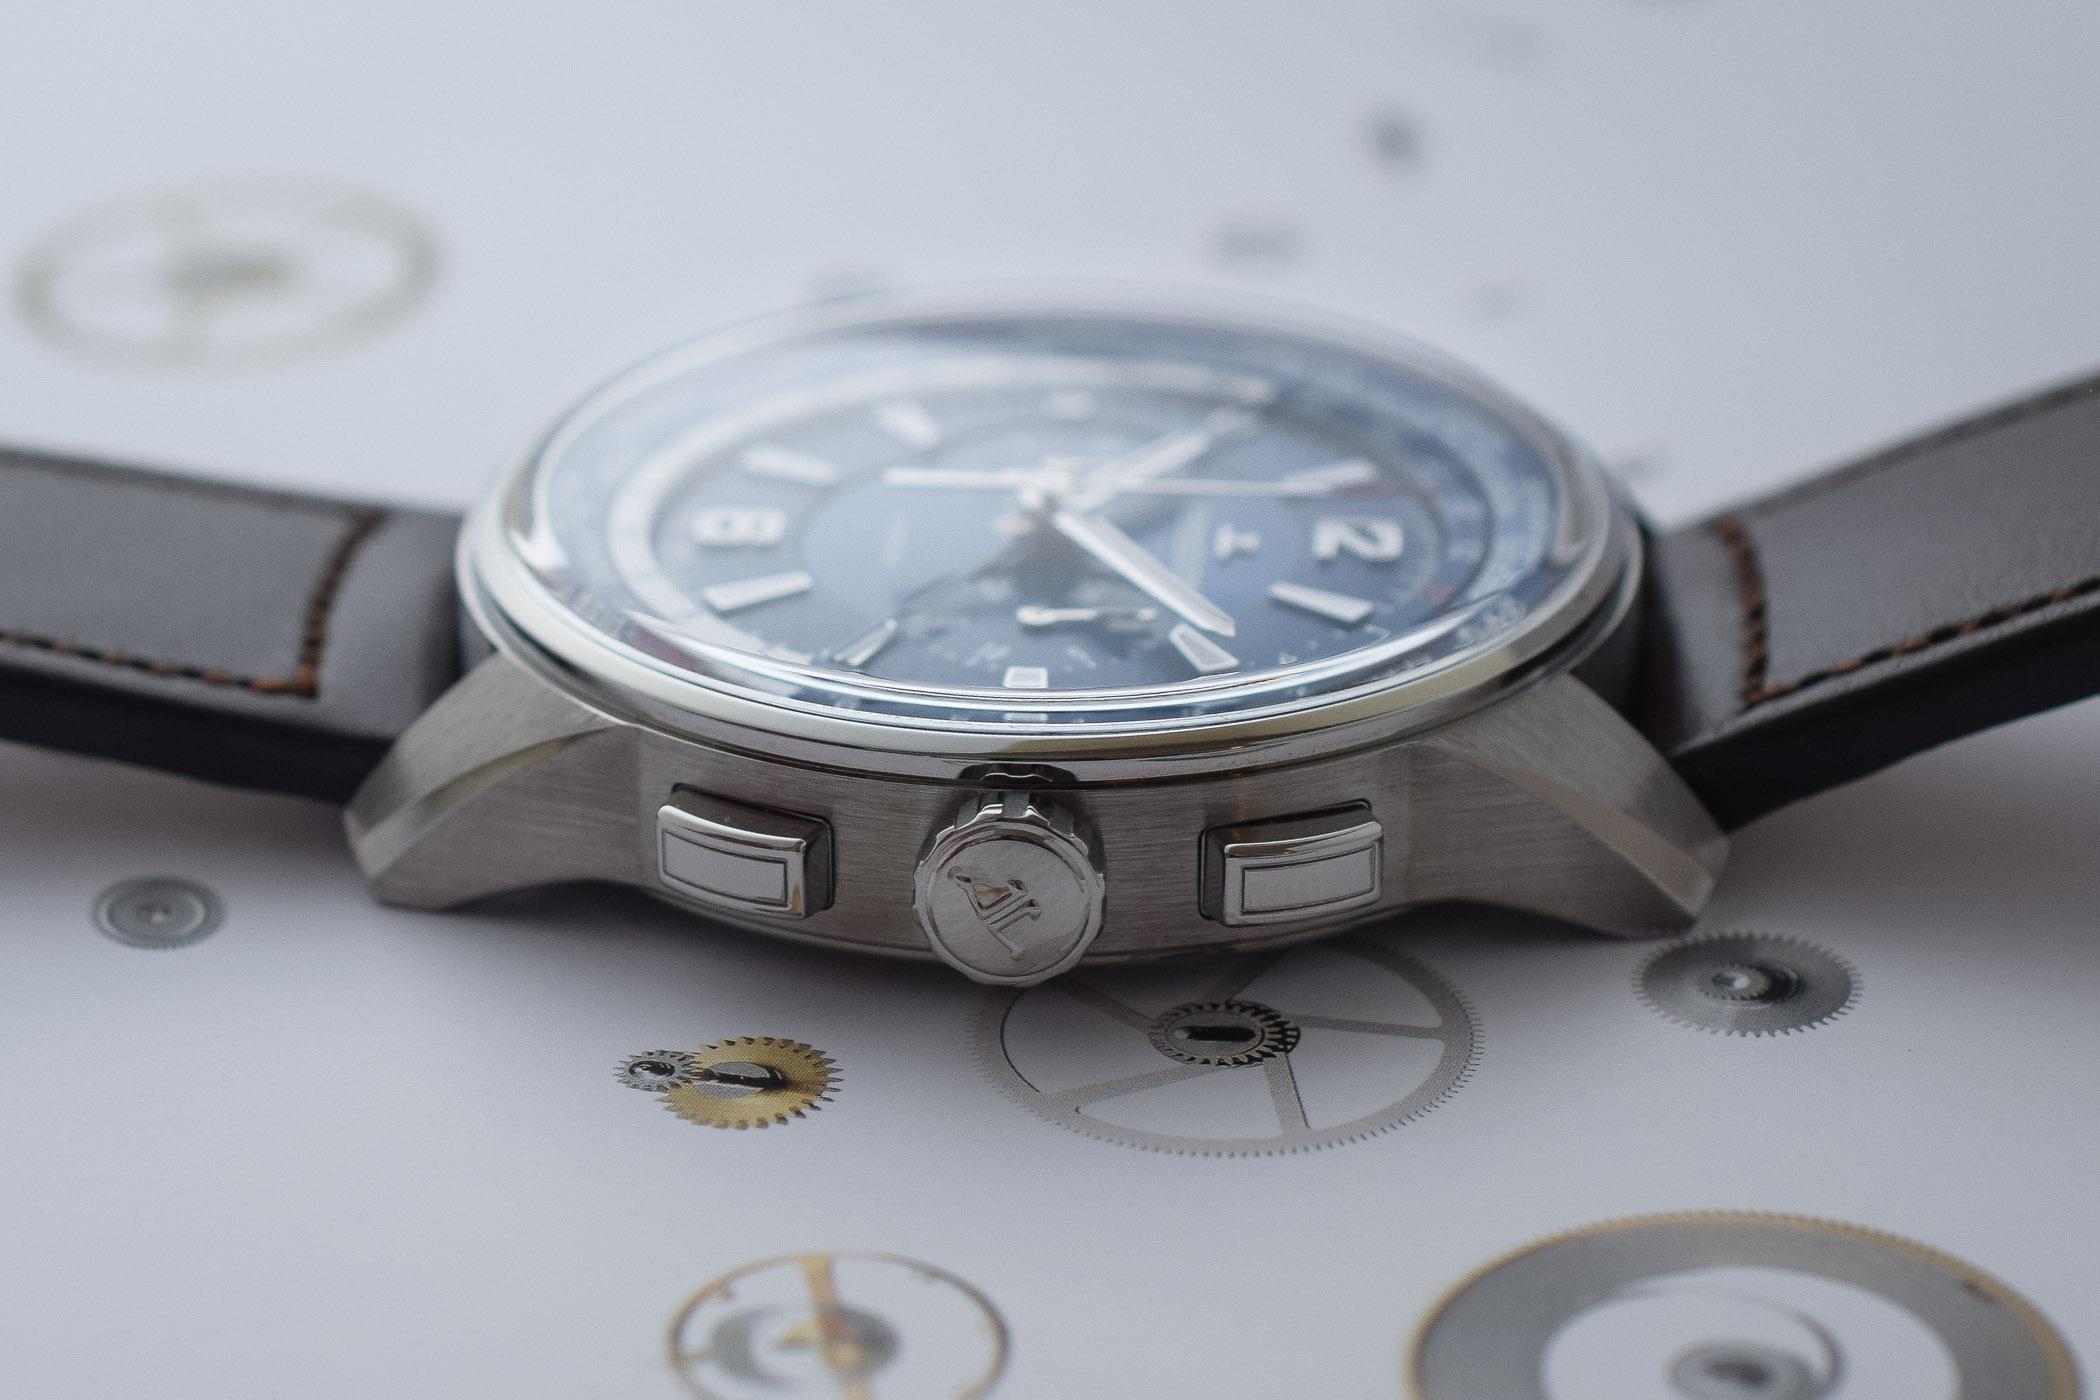 Jaeger-LeCoultre Polaris Chronograph WorldTimer - Review - 3